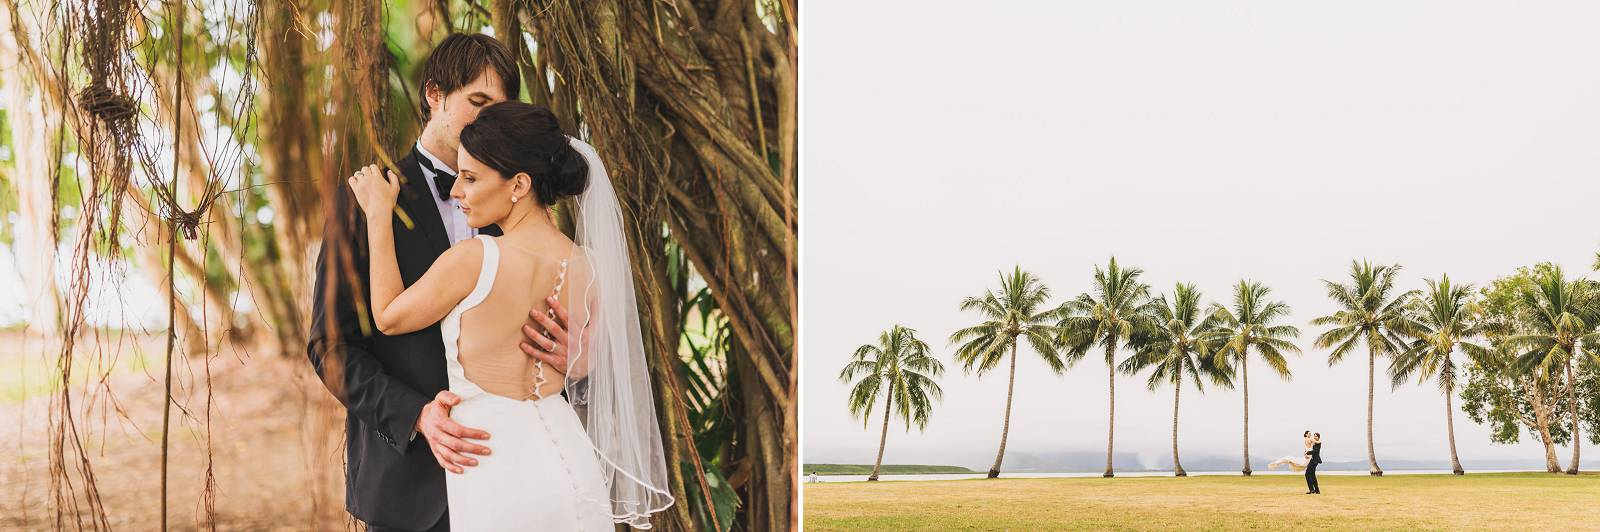 Rex Smeal Park Wedding Photo